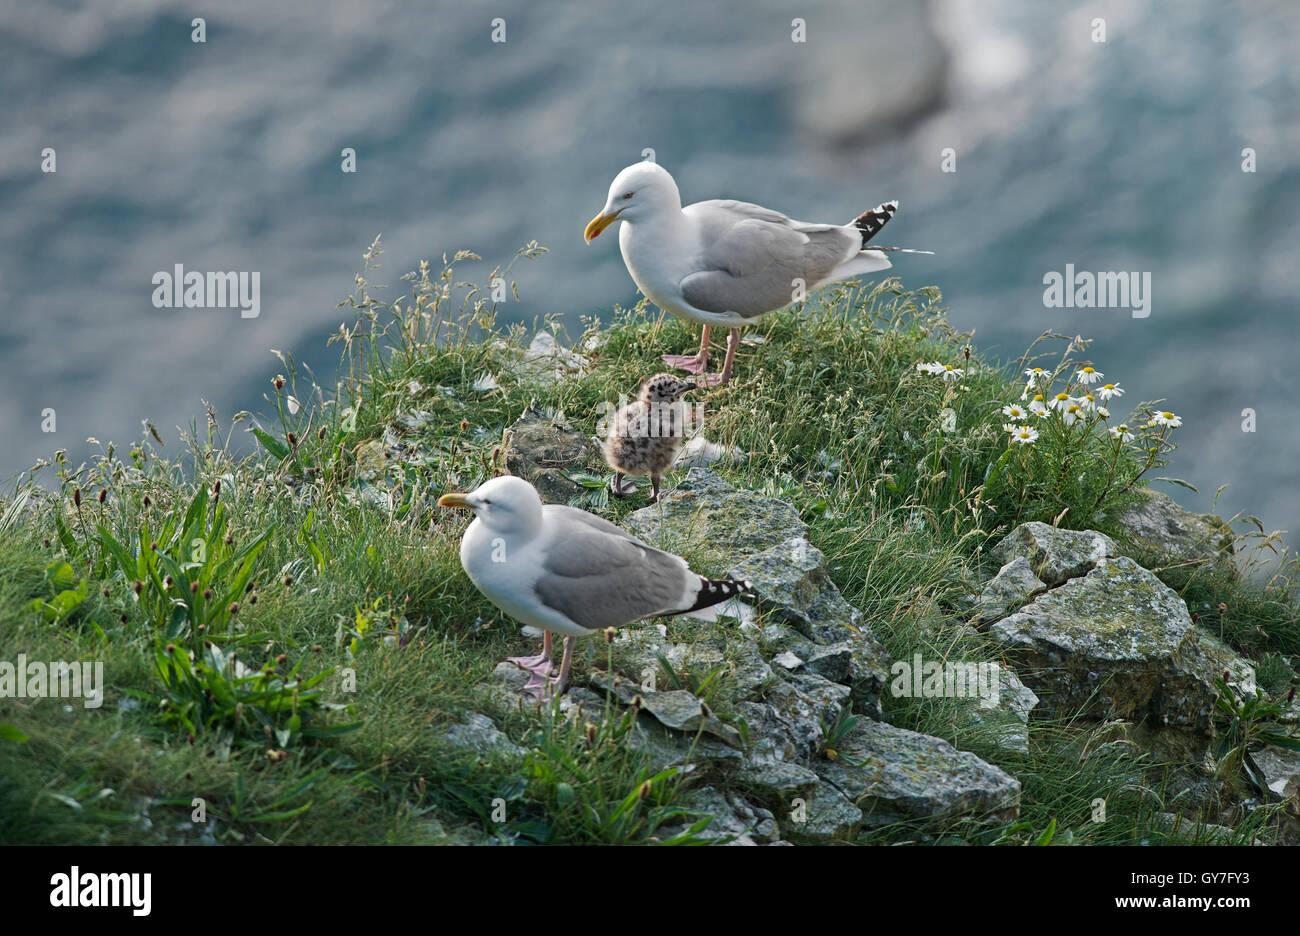 Herring Gulls-Larus argentatus with chick on nest. Uk - Stock Image